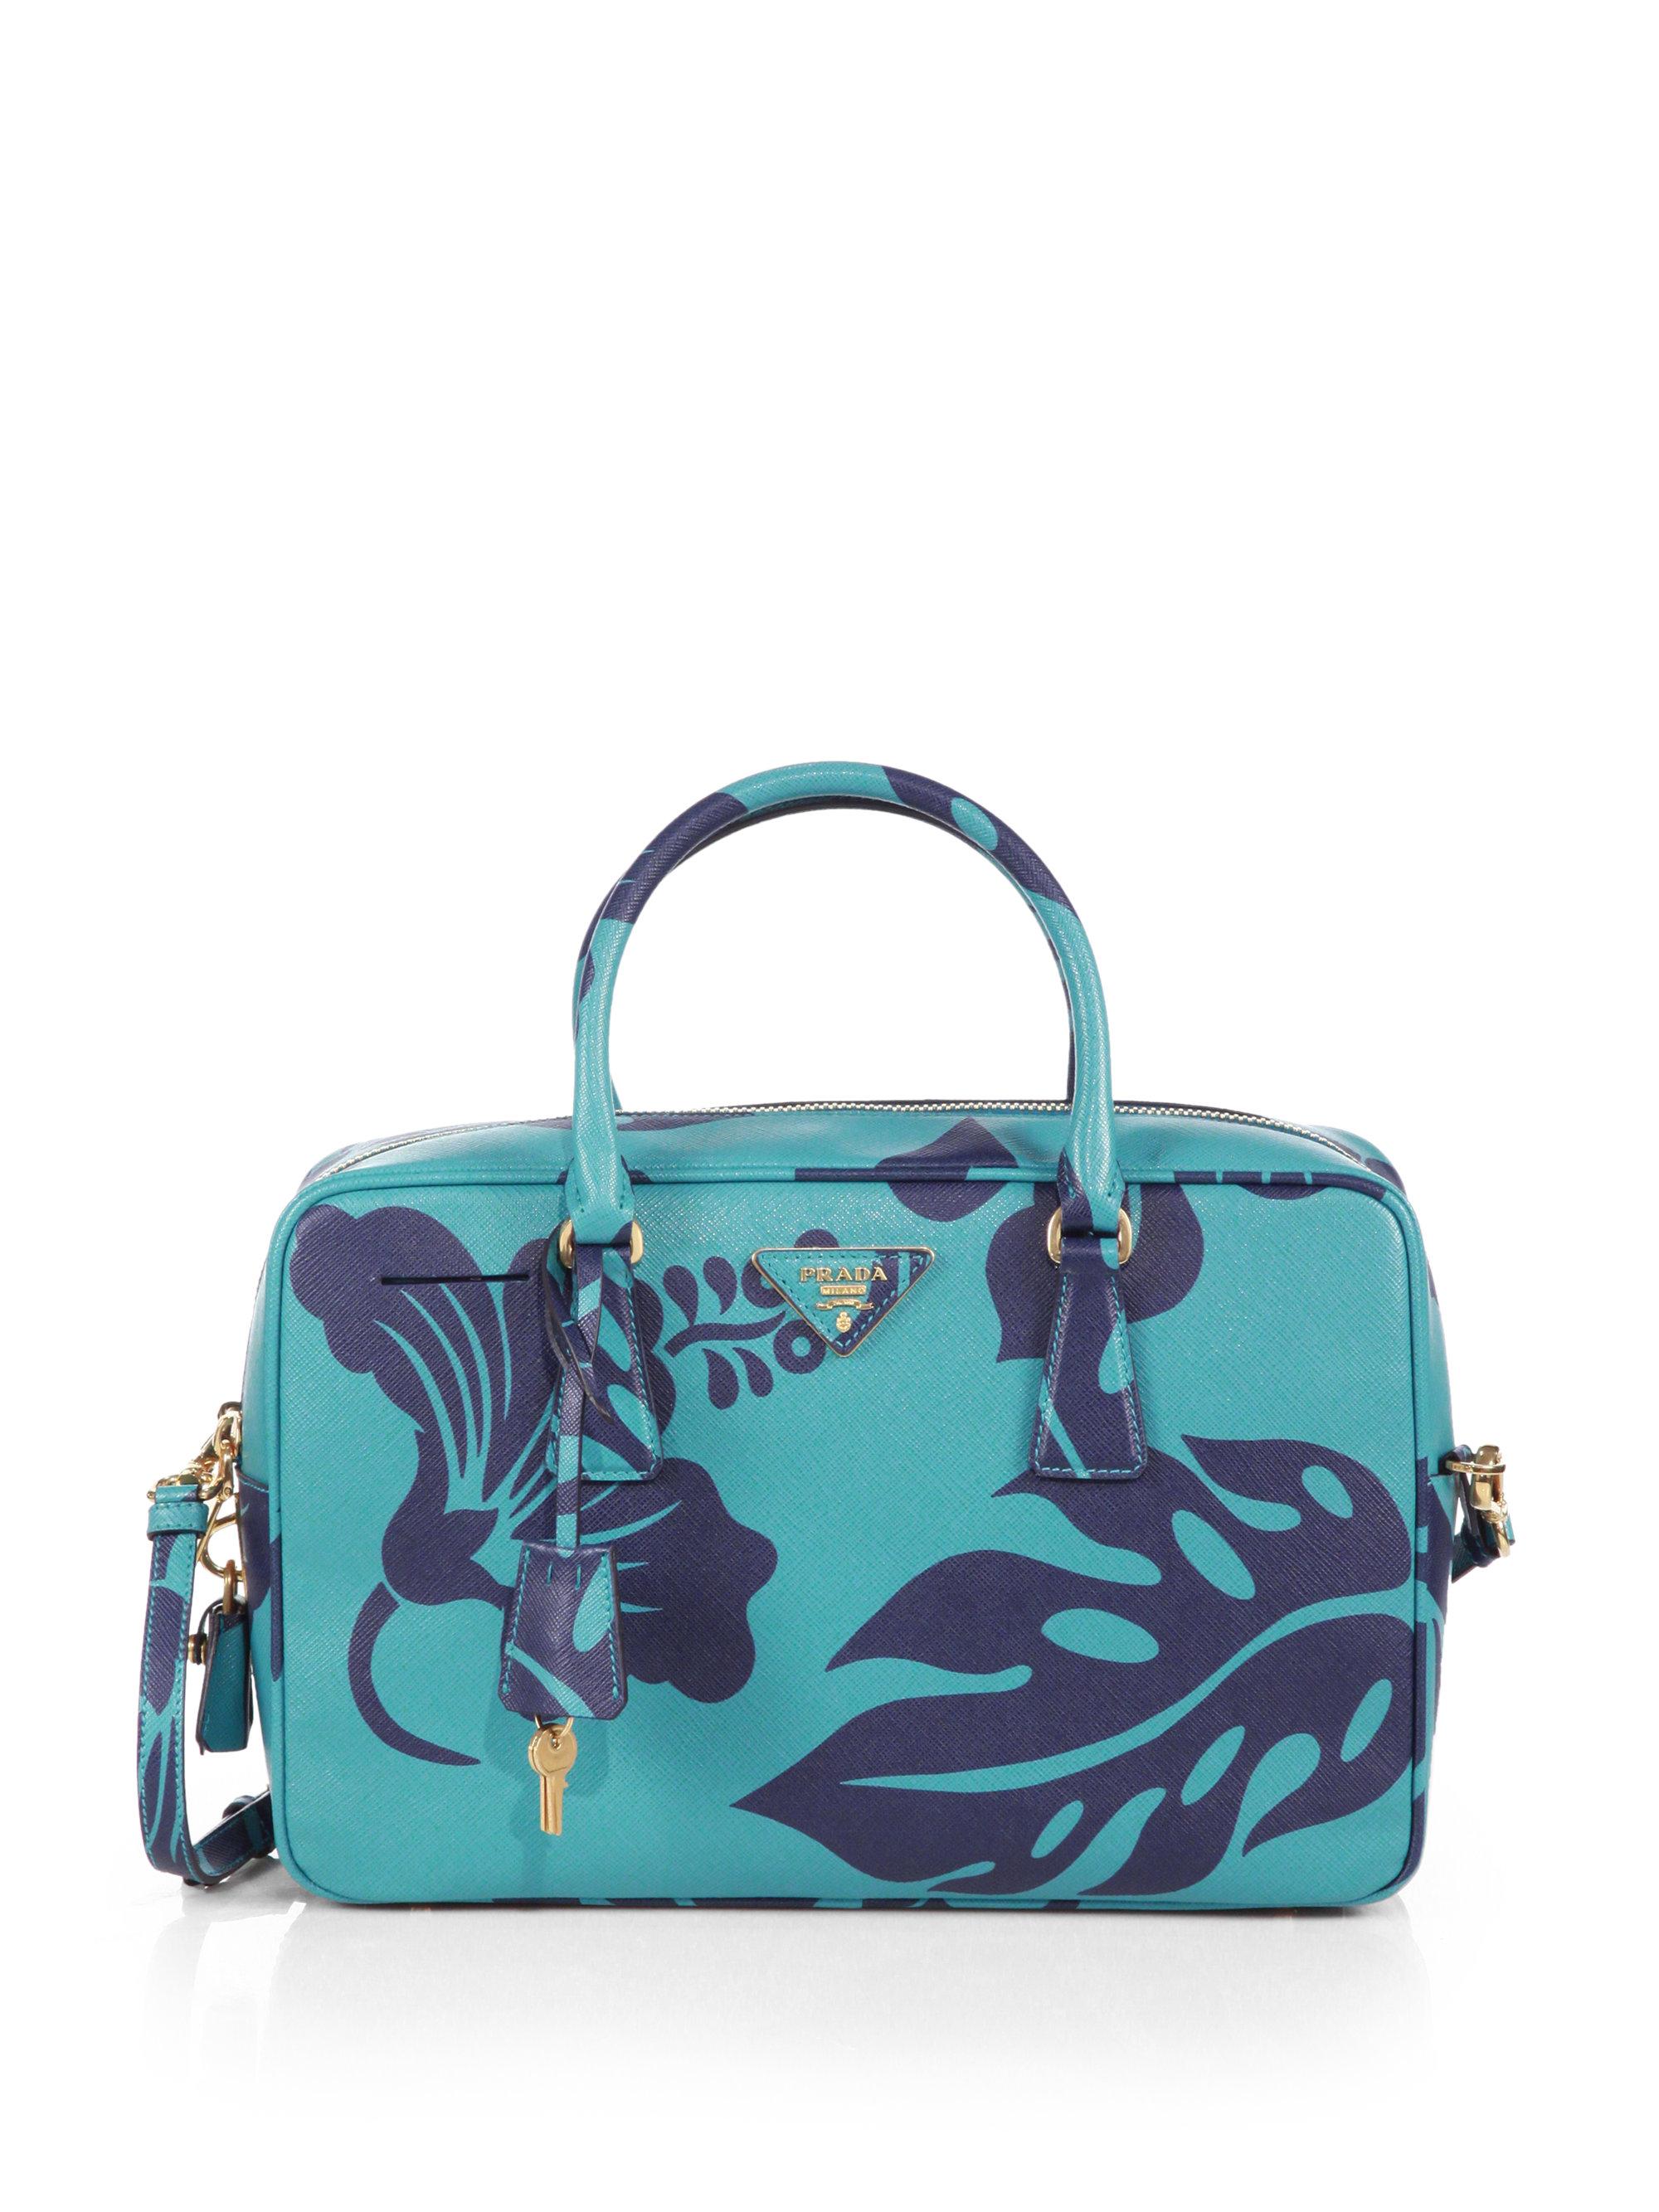 9c220c8f432b22 discount code for lyst prada rabbit print python inside bag in blue b77a9  f6f76; low cost lyst prada saffiano print tv bag in blue 16945 88c9a